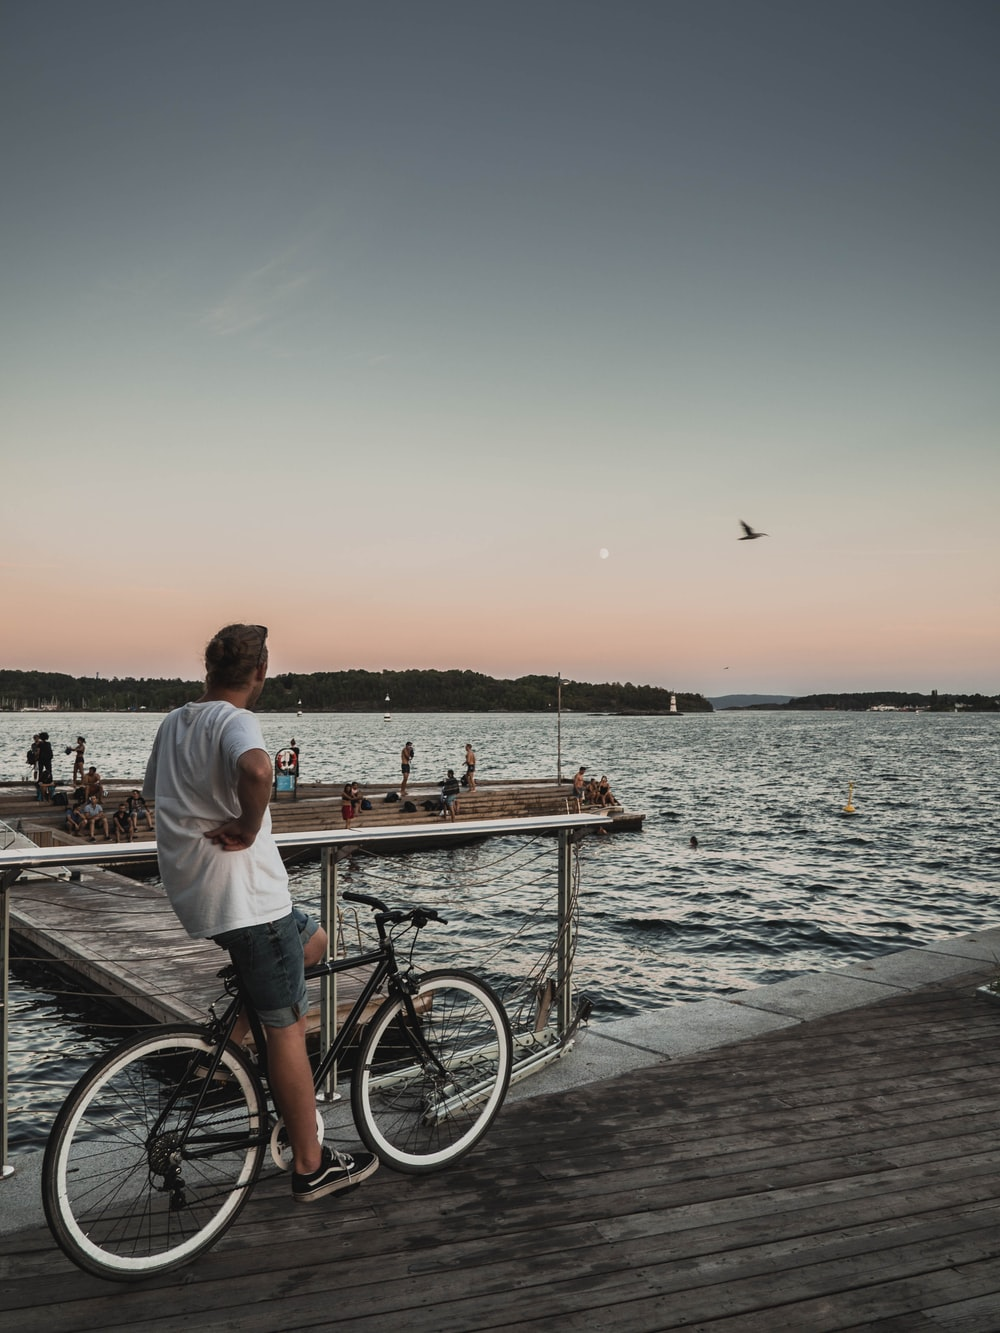 man riding bicycle while watching people on dock during daytime